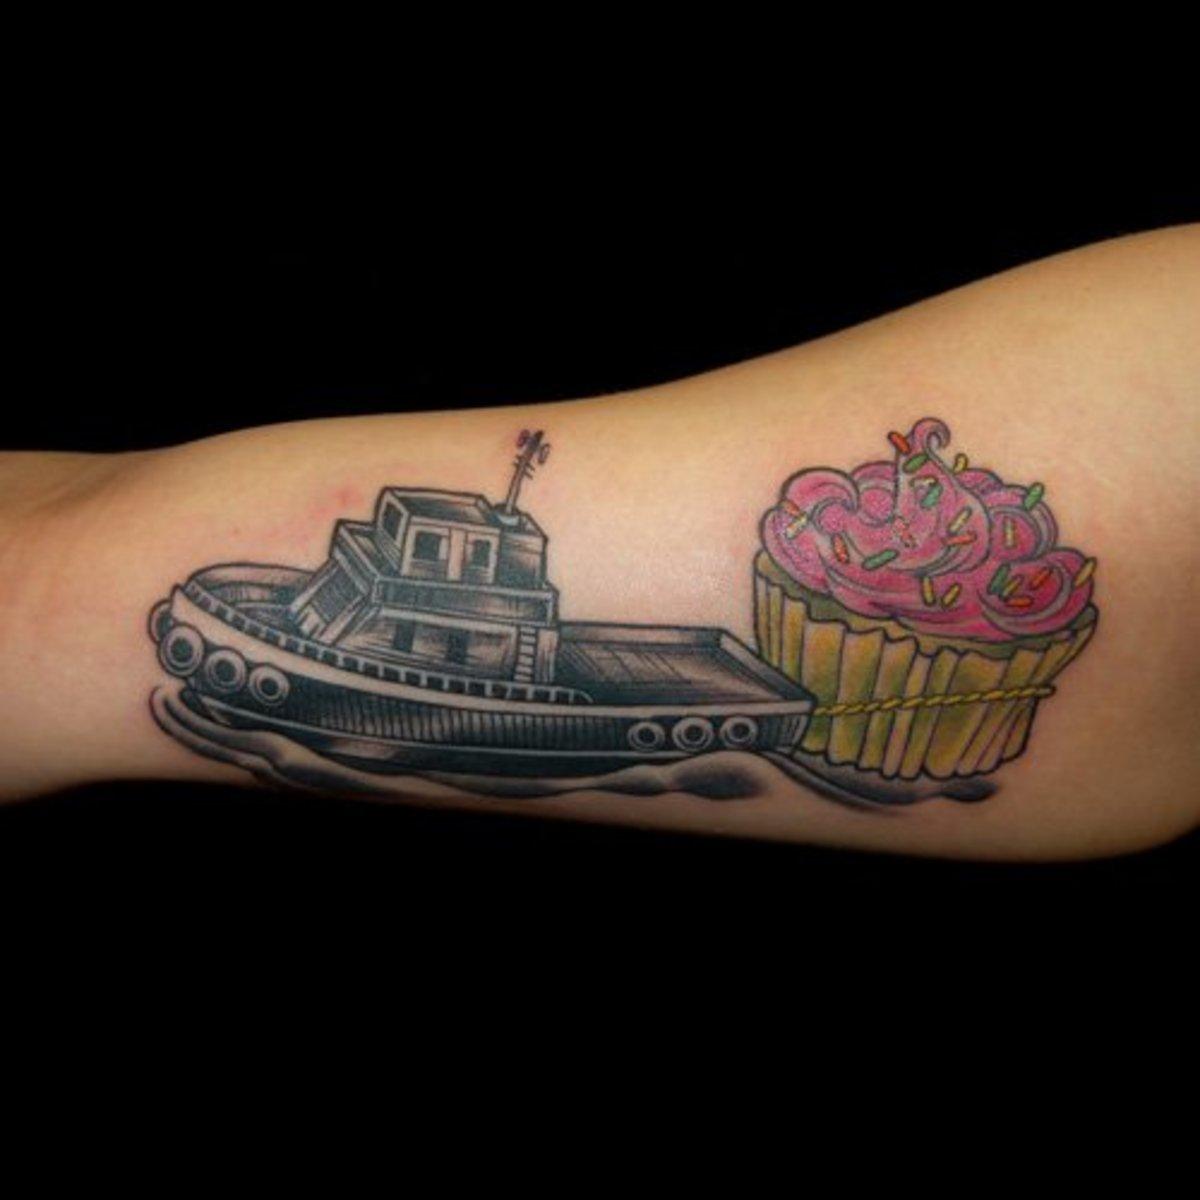 idei-dlya-tatuirovok - Лодка и корабль татуировки -  - фото